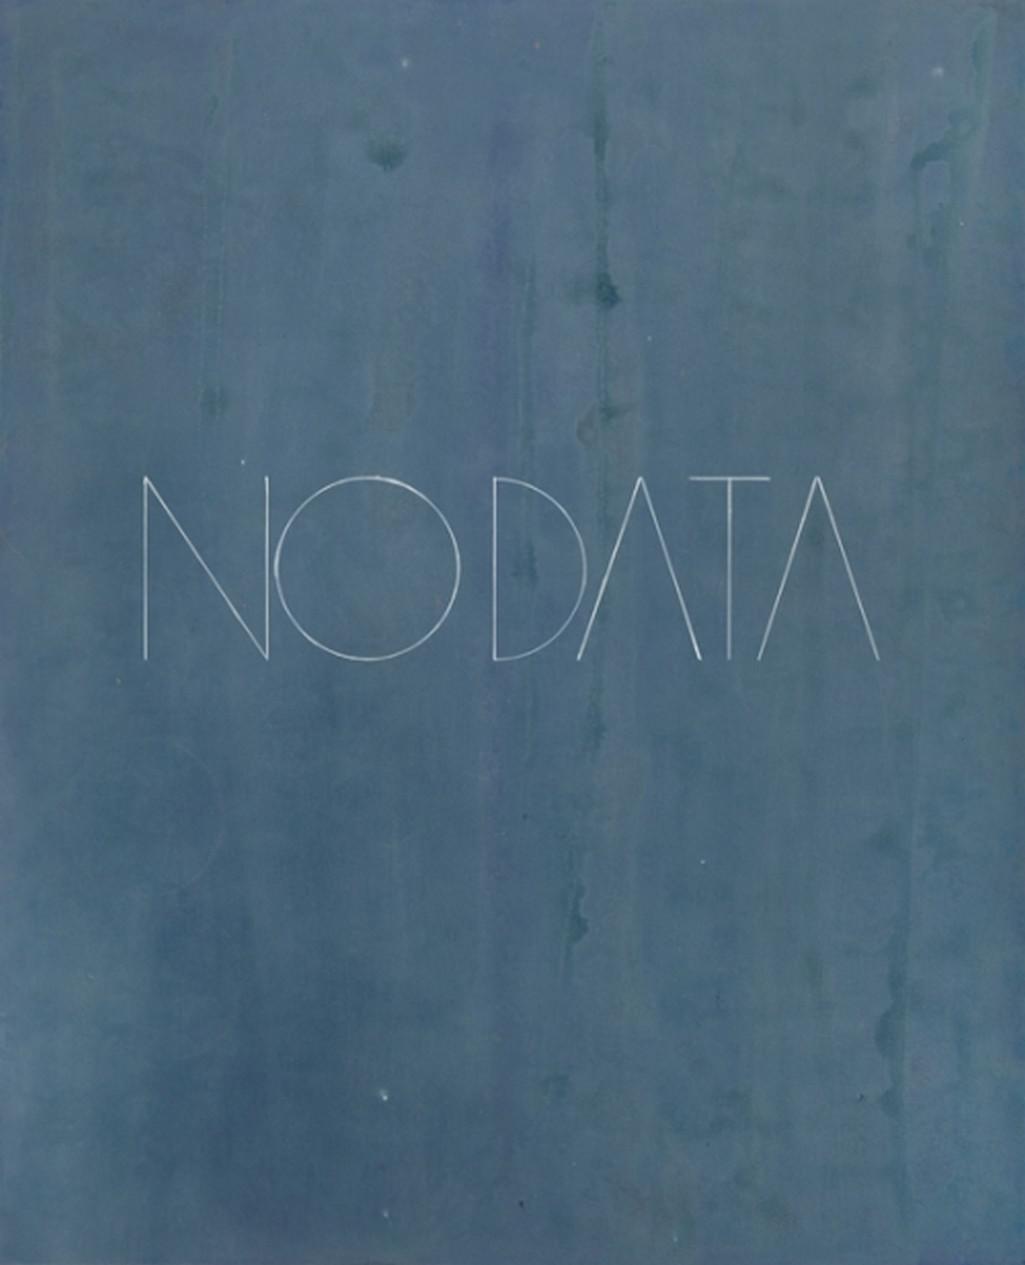 Josef Archrer / No Data no. 9, z cyklu Data, 2017